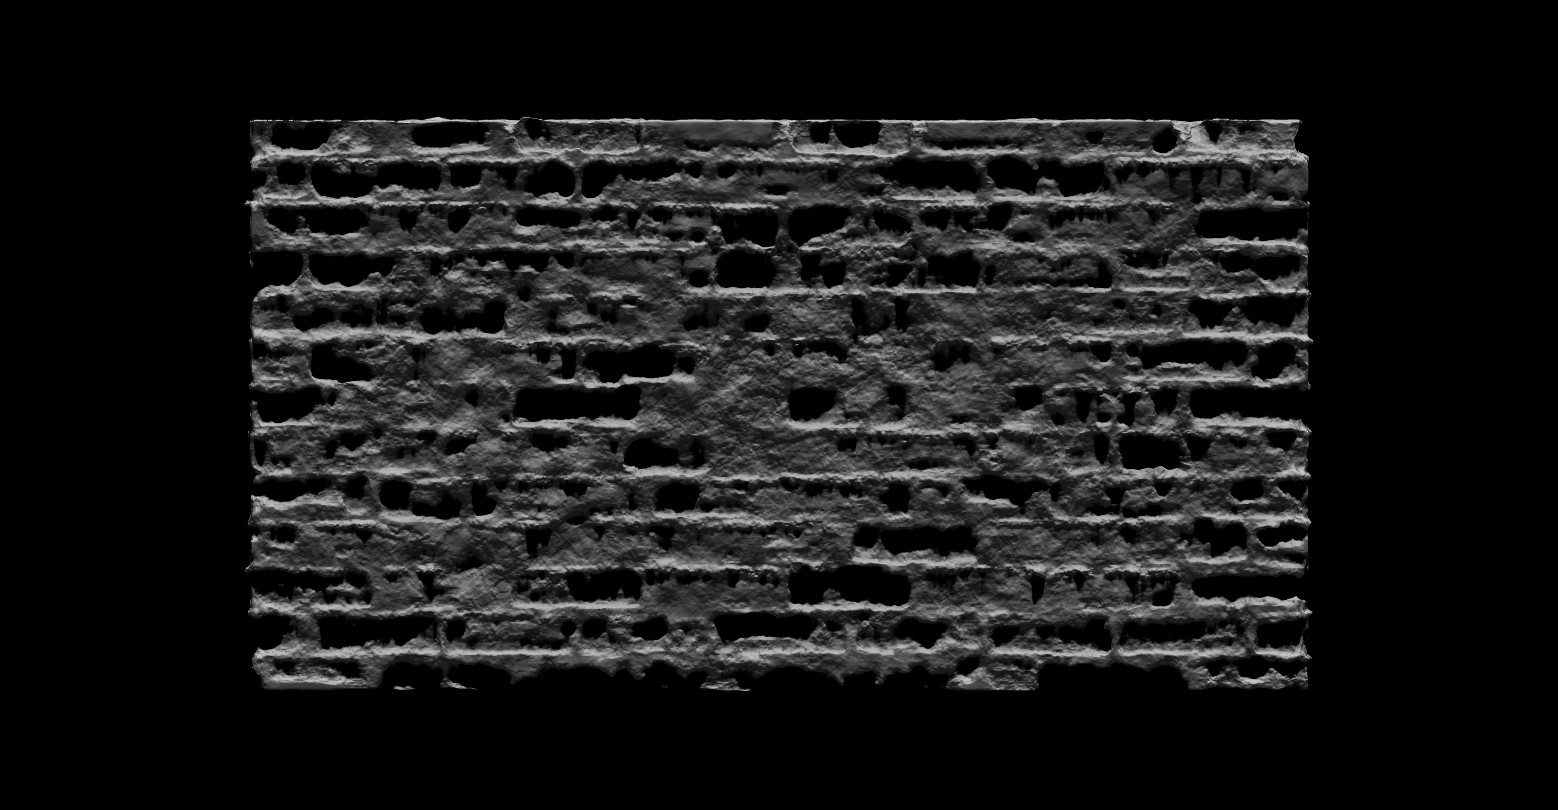 Bela csampai brick wall 01 render zb 03